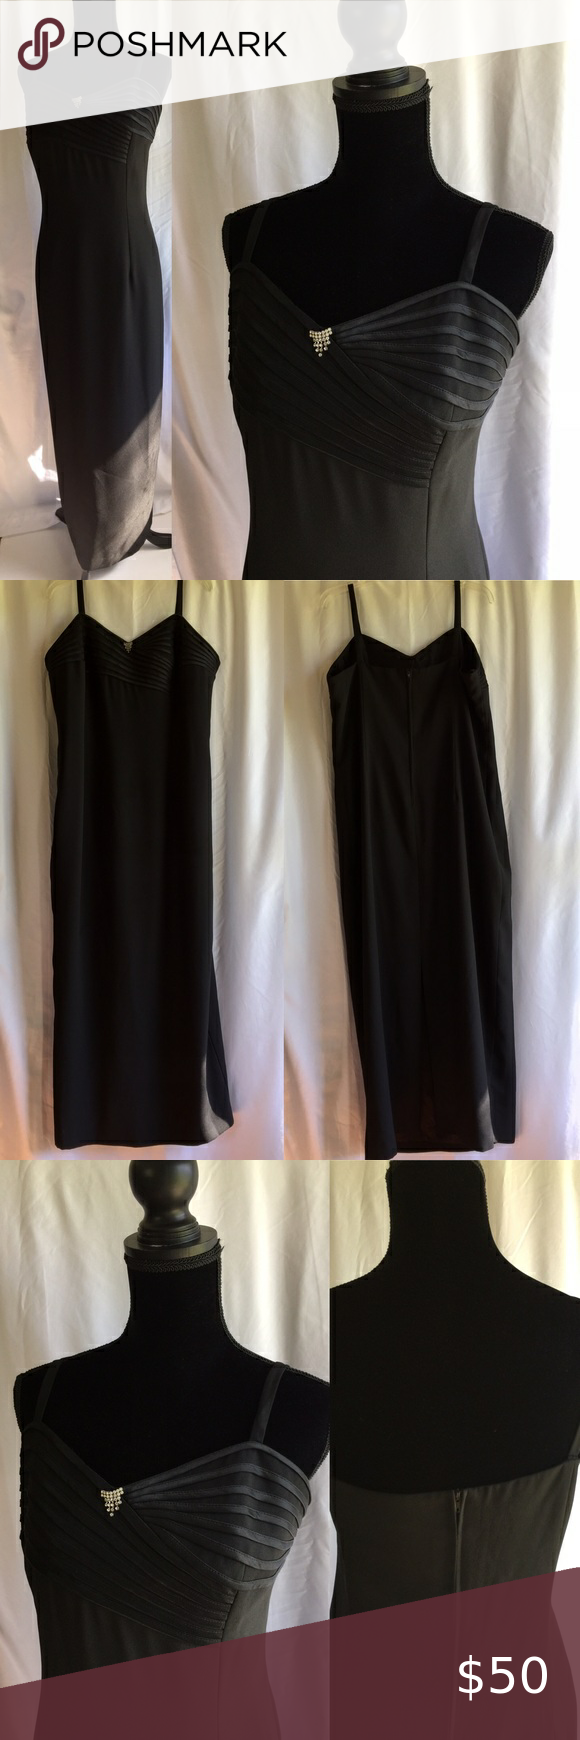 Black Long Formal Dress Bridesmaids Preloved Sz 18 Formal Wear Dresses Formal Dresses Long Formal Dresses [ 1740 x 580 Pixel ]